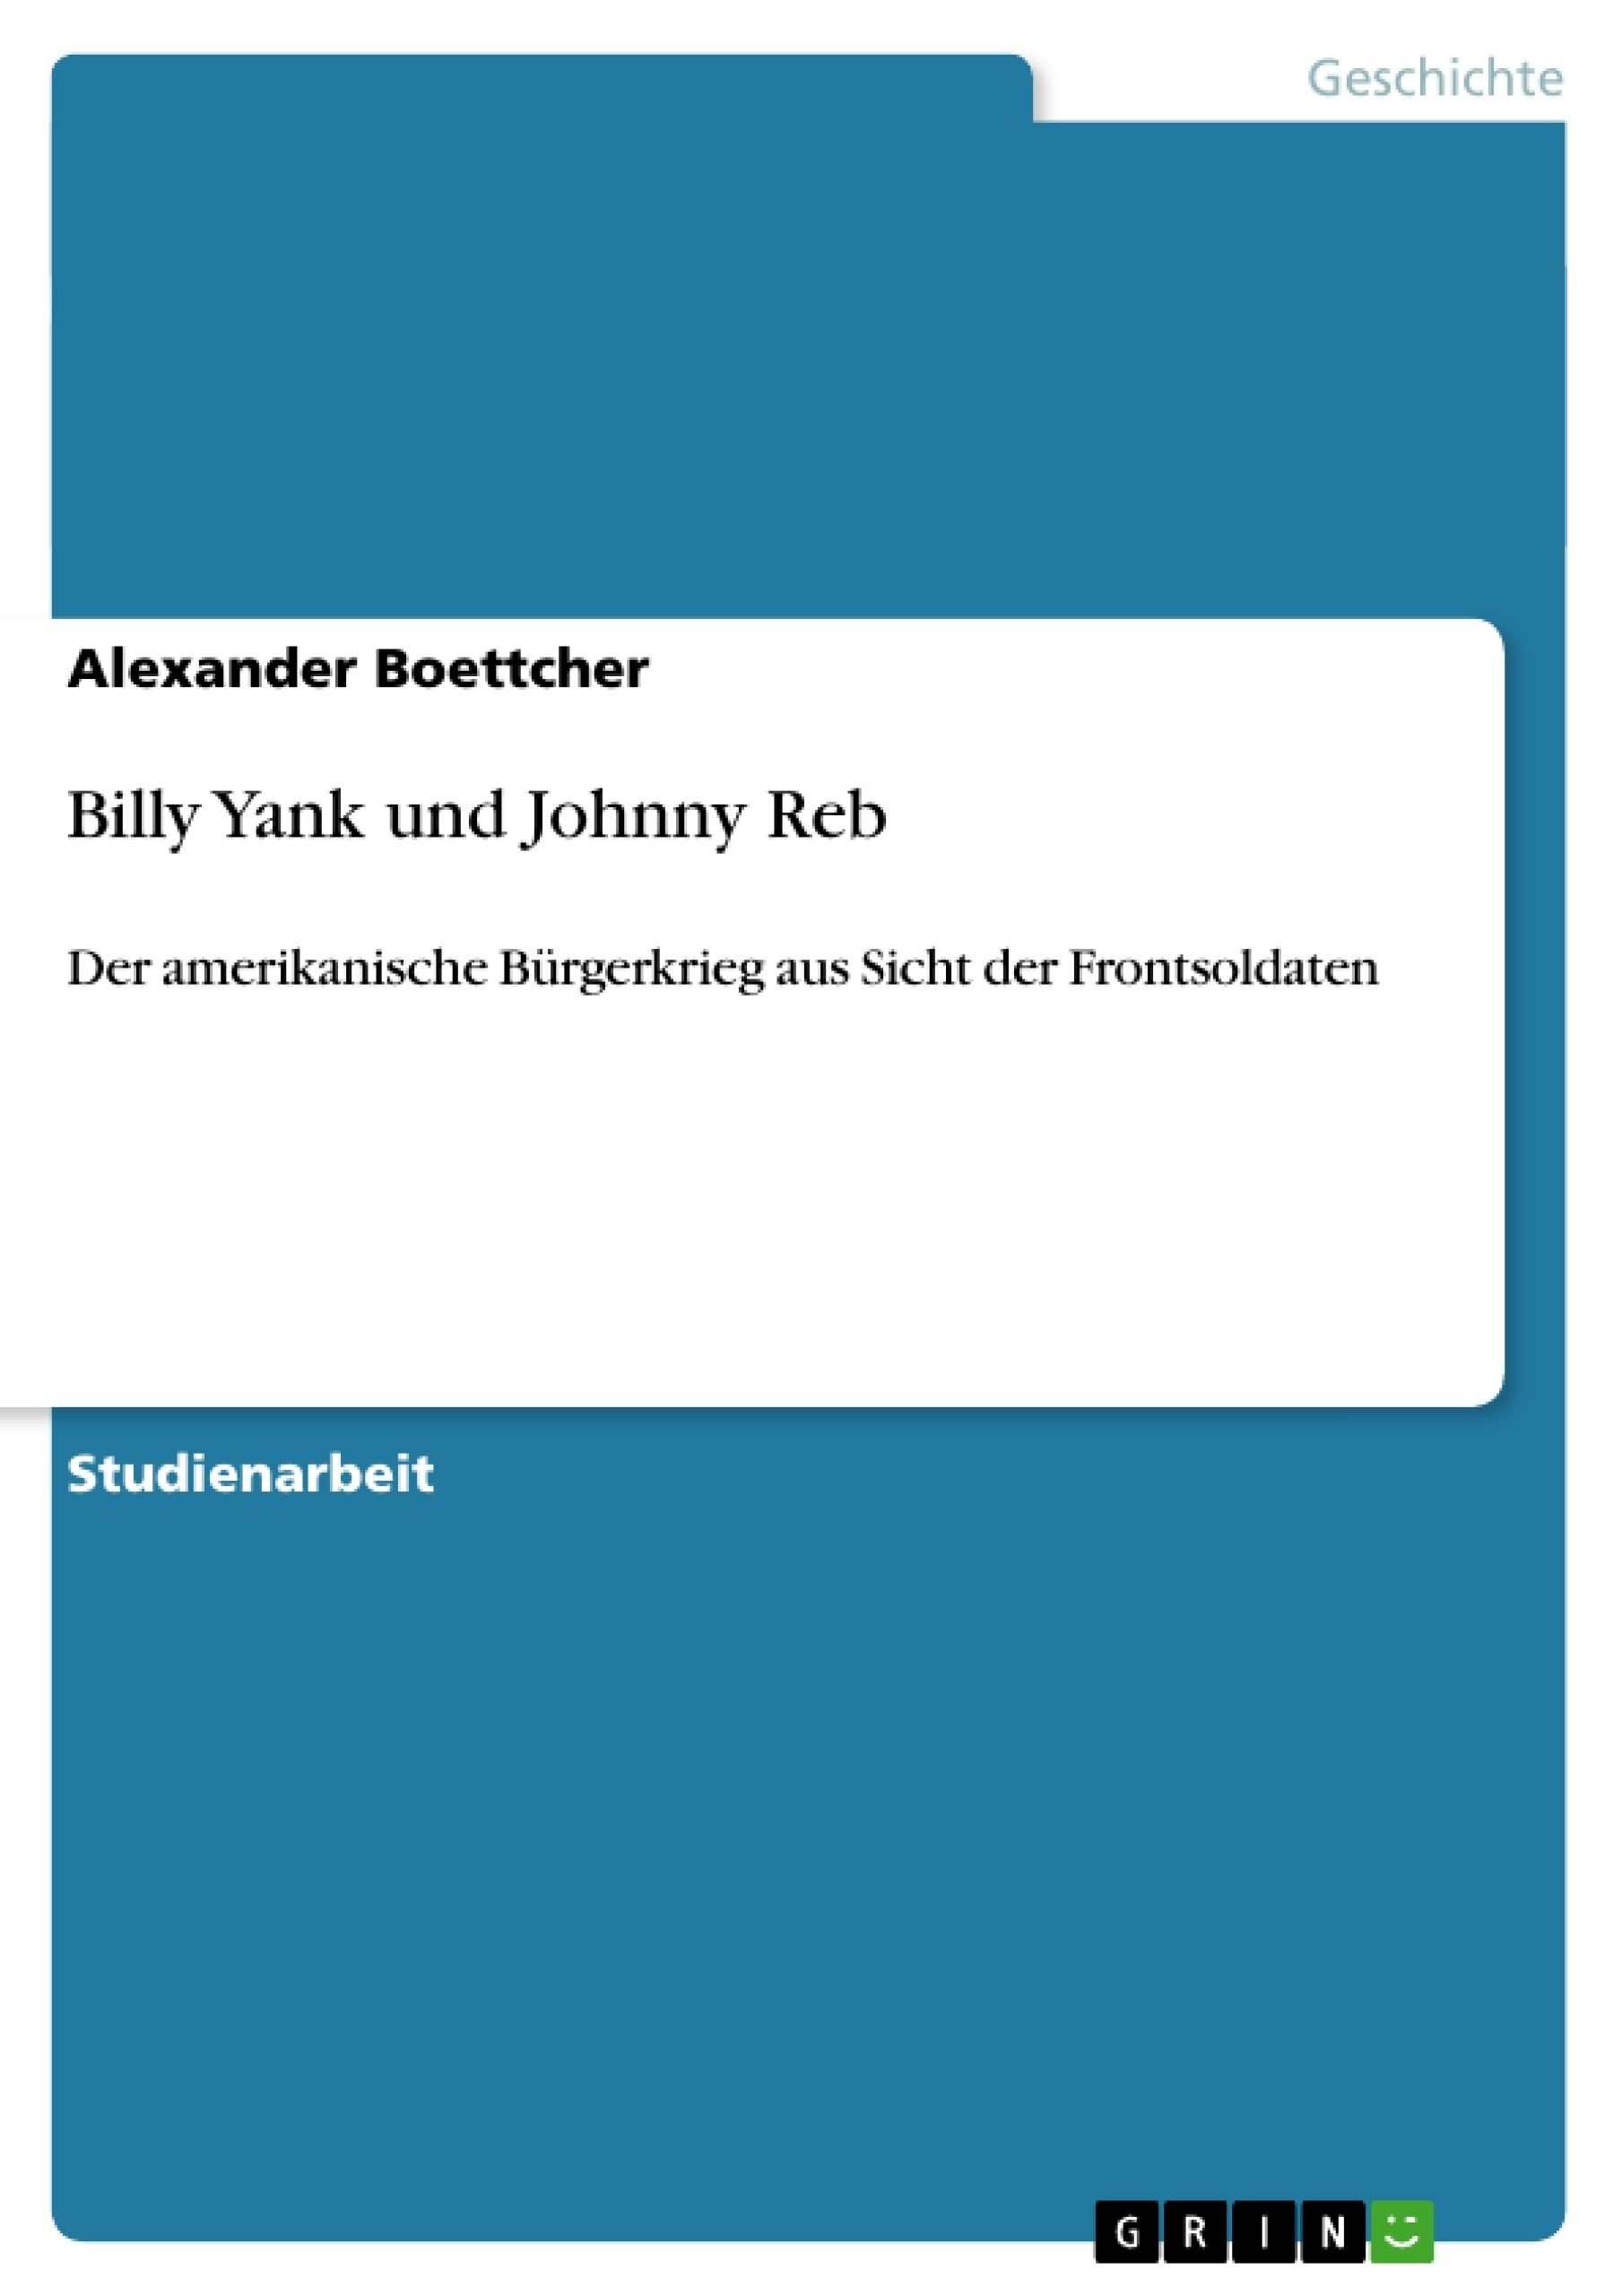 Titel: Billy Yank und Johnny Reb